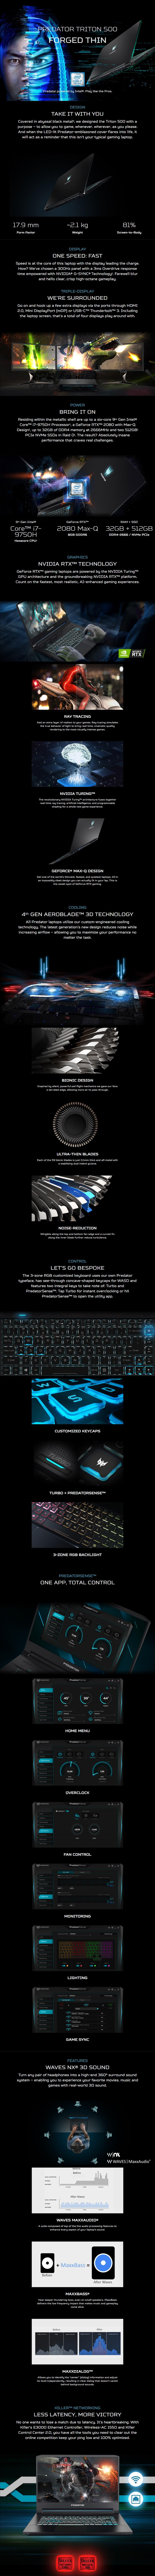 "Acer Predator Triton 500 15.6"" 144Hz Gaming Notebook i7-9750H 32GB 512GB RTX2080 - Overview 1"